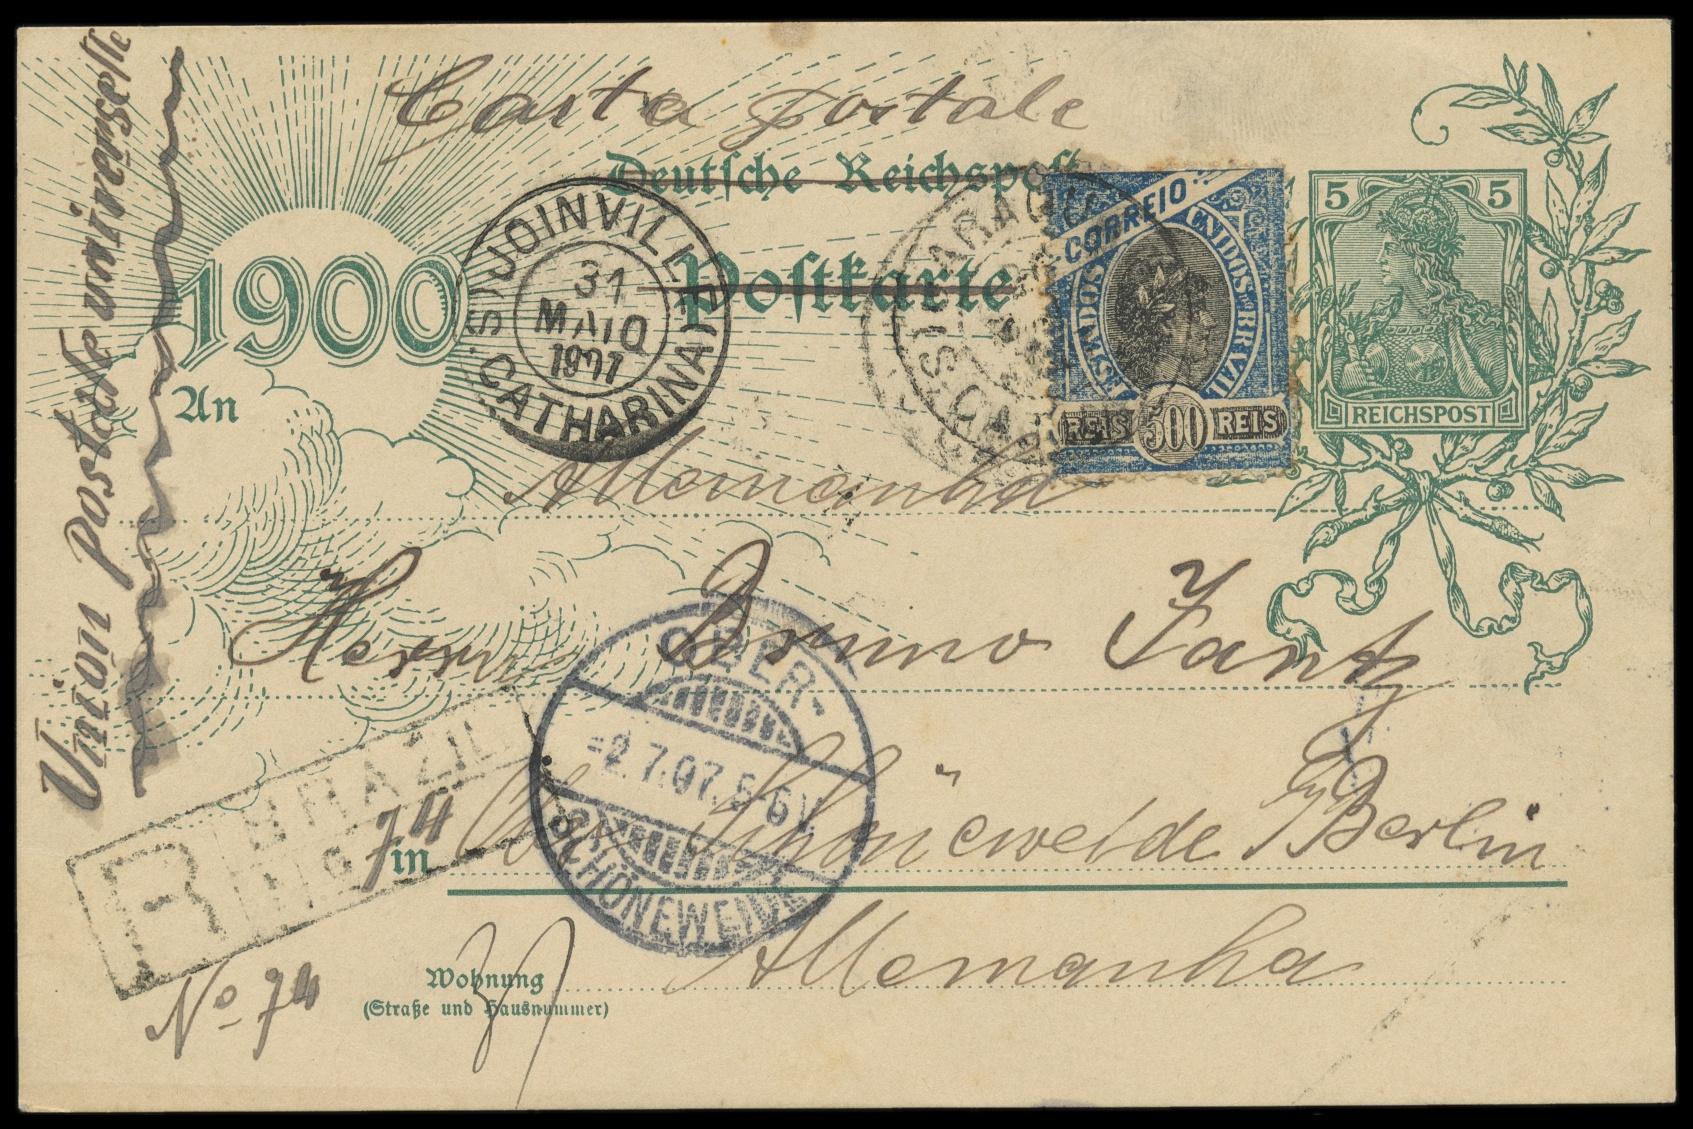 Lot 587 - übersee brasilien -  Peter Harlos Auctions 42. Harlos Auktion